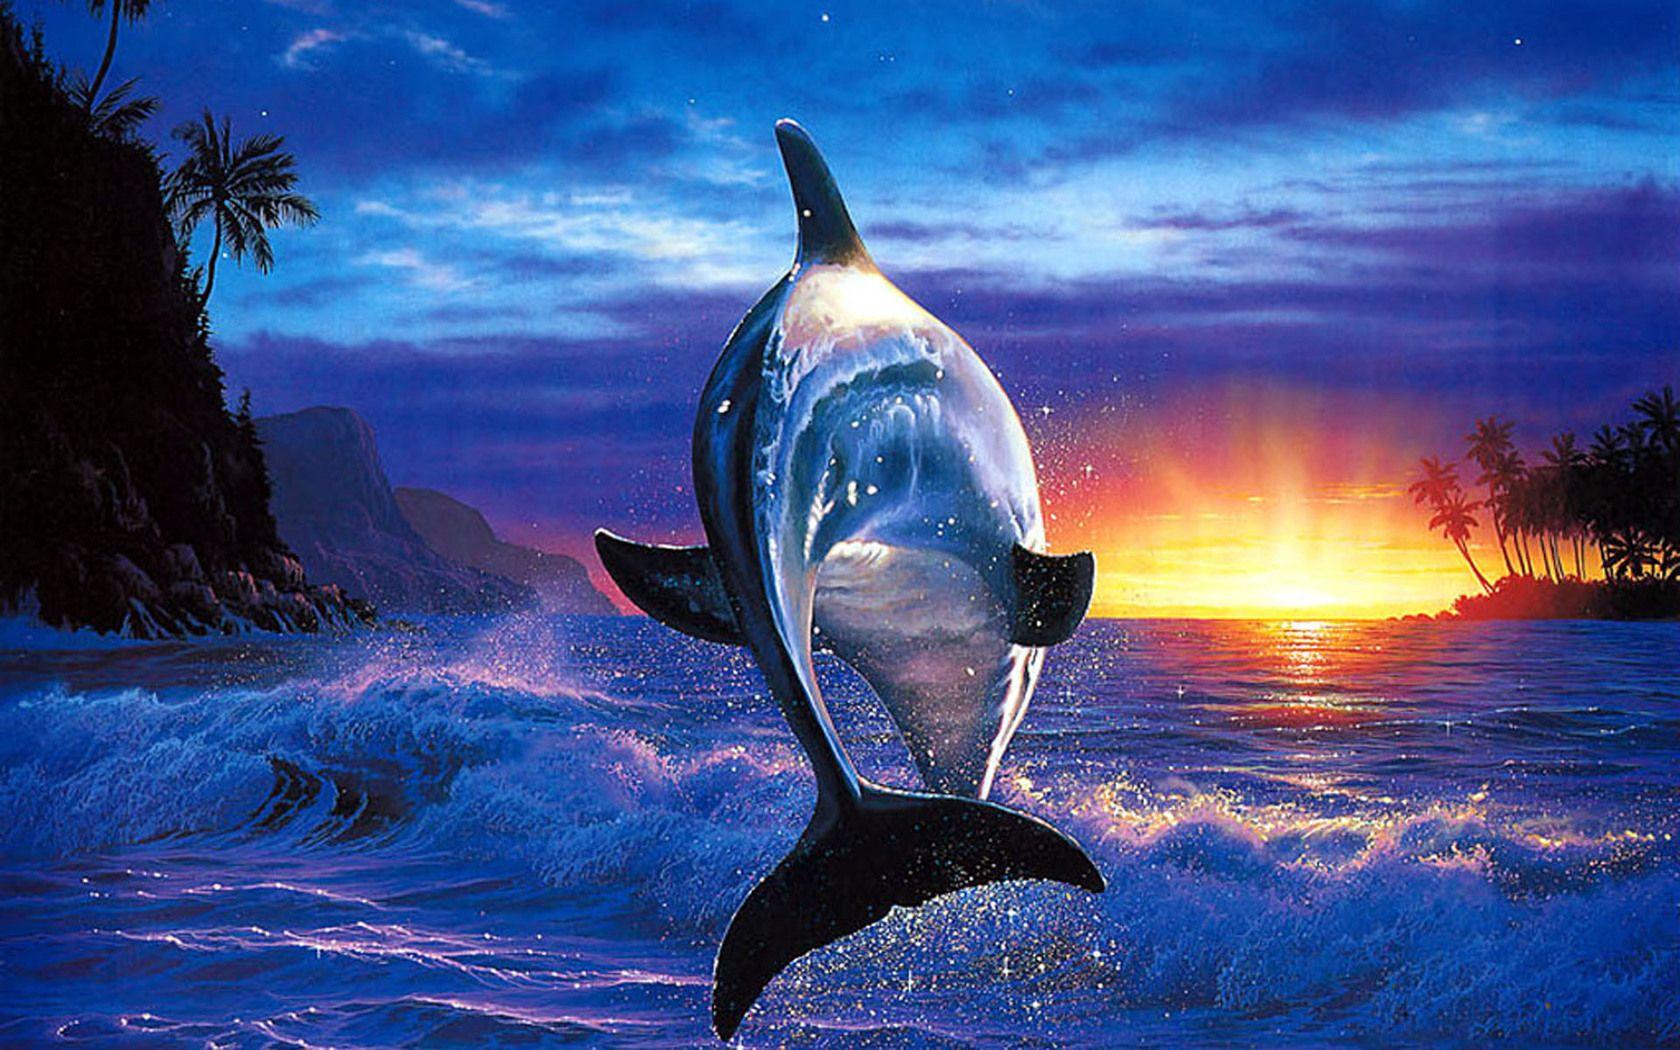 Dolphin Wallpaper Sea Blue Aquarium Beautiful Dolphin Painting Dolphins Sea Dolphin Full hd dolphin wallpapers hd desktop